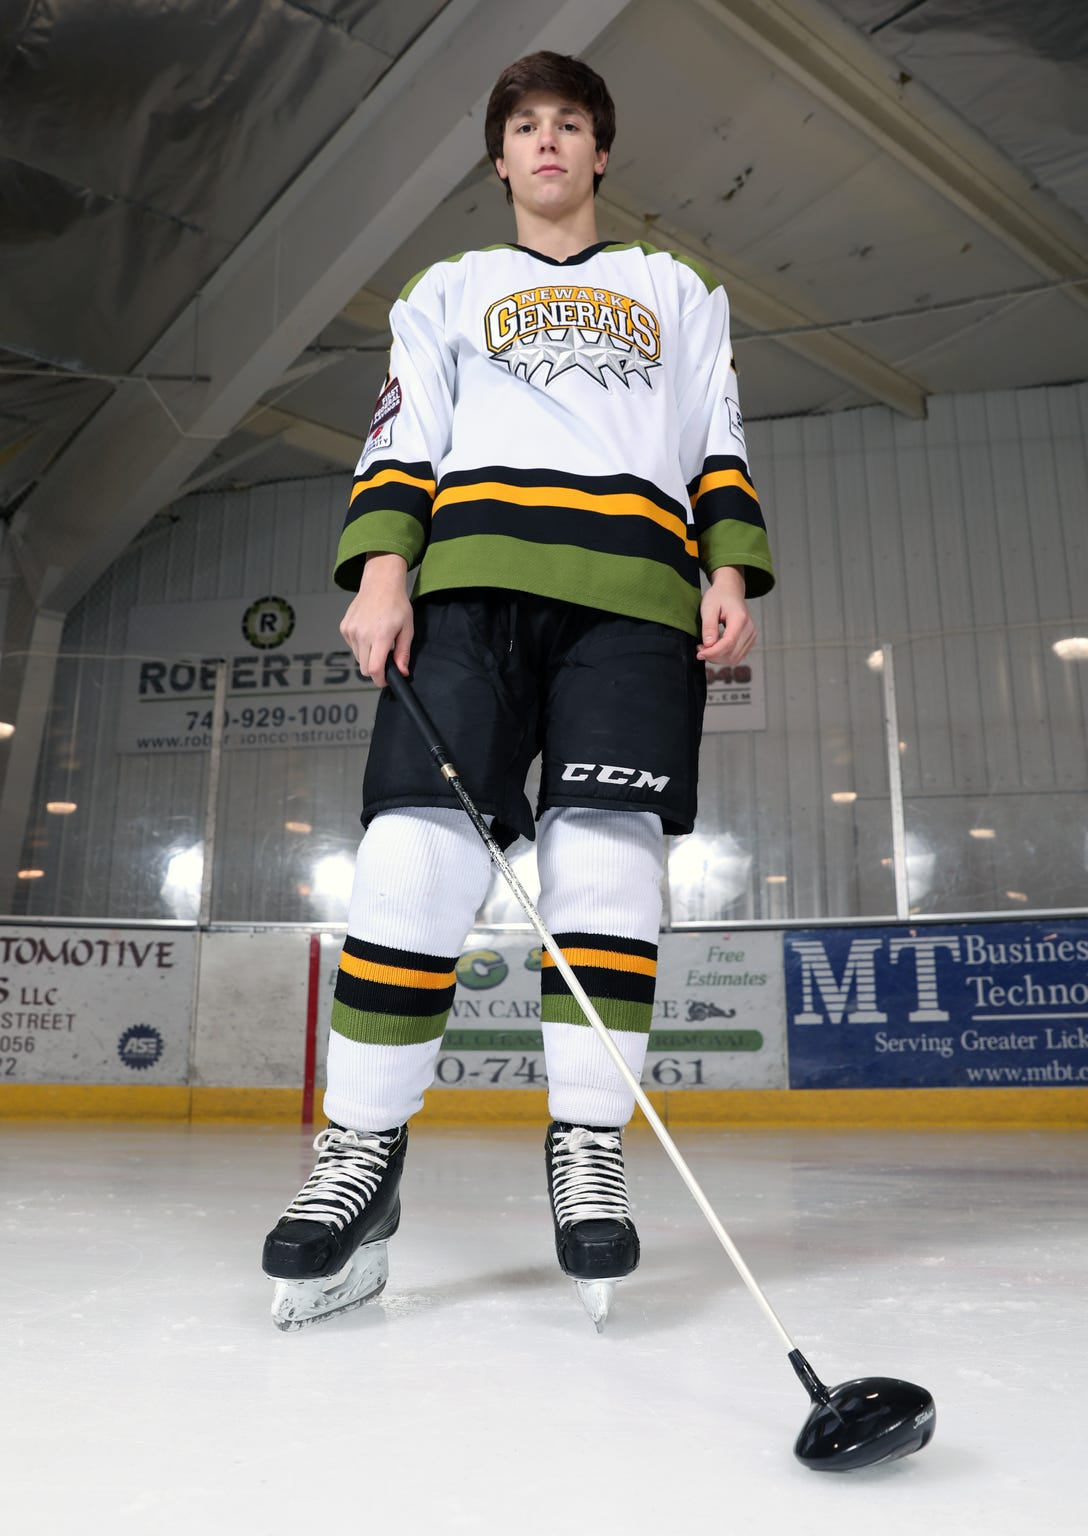 Tri-Valley High School golfer Drew Johnson also plays hockey for the Newark Generals.